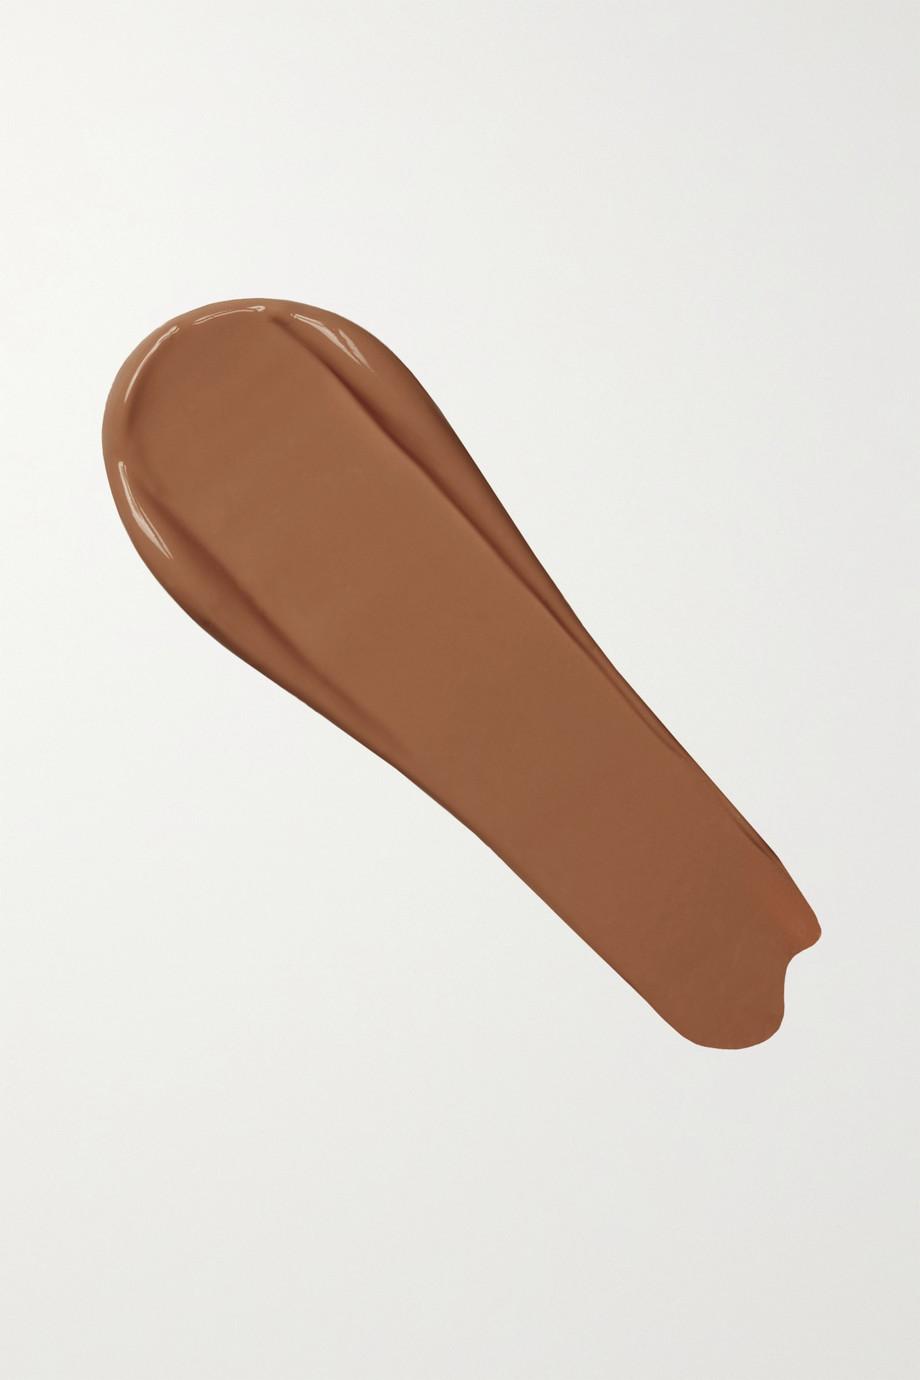 Pat McGrath Labs Skin Fetish: Sublime Perfection Concealer - D30, 5ml